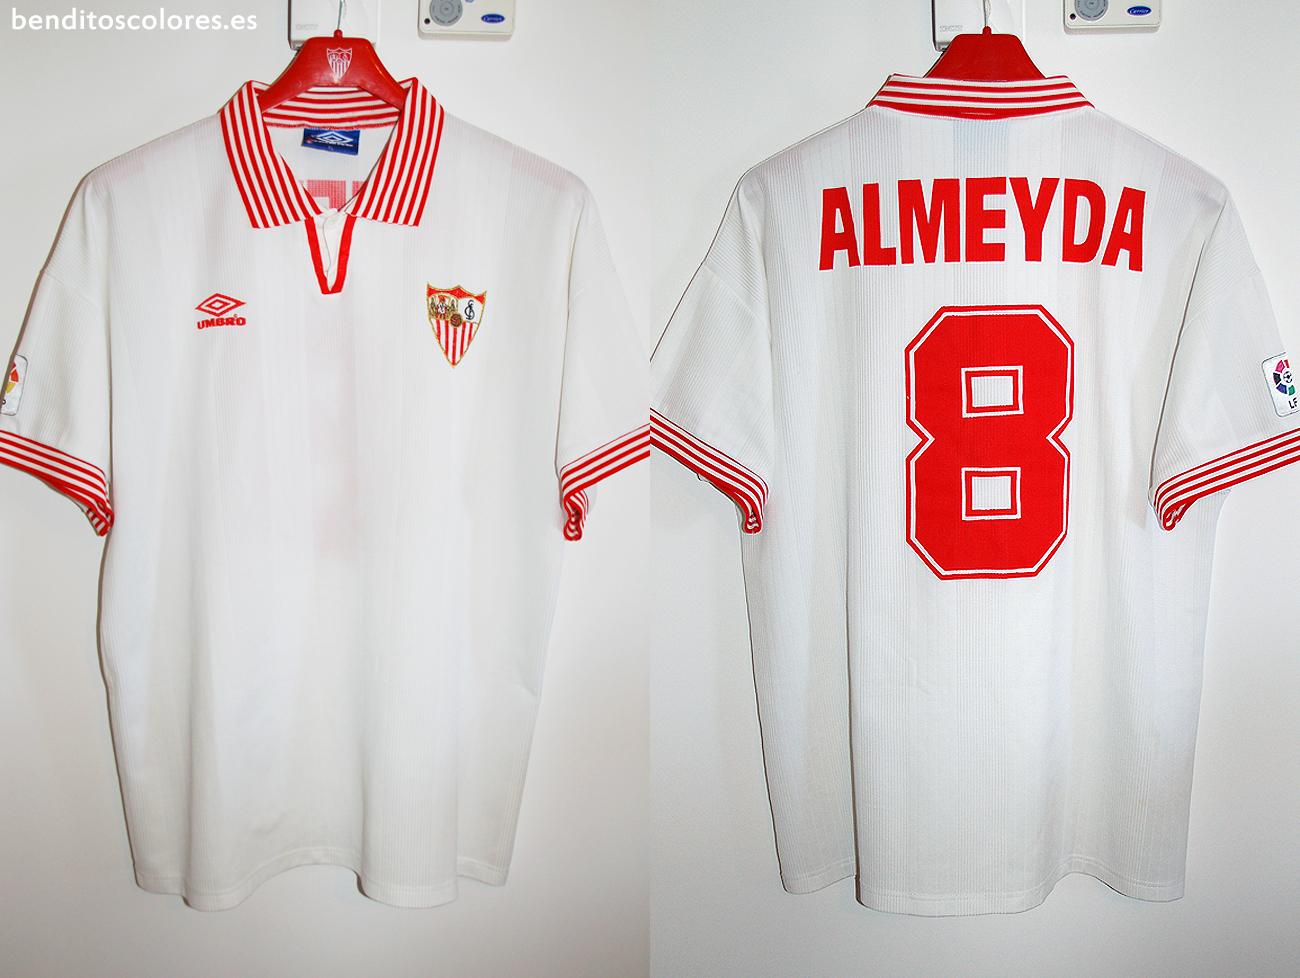 segunda equipacion Sevilla FC venta